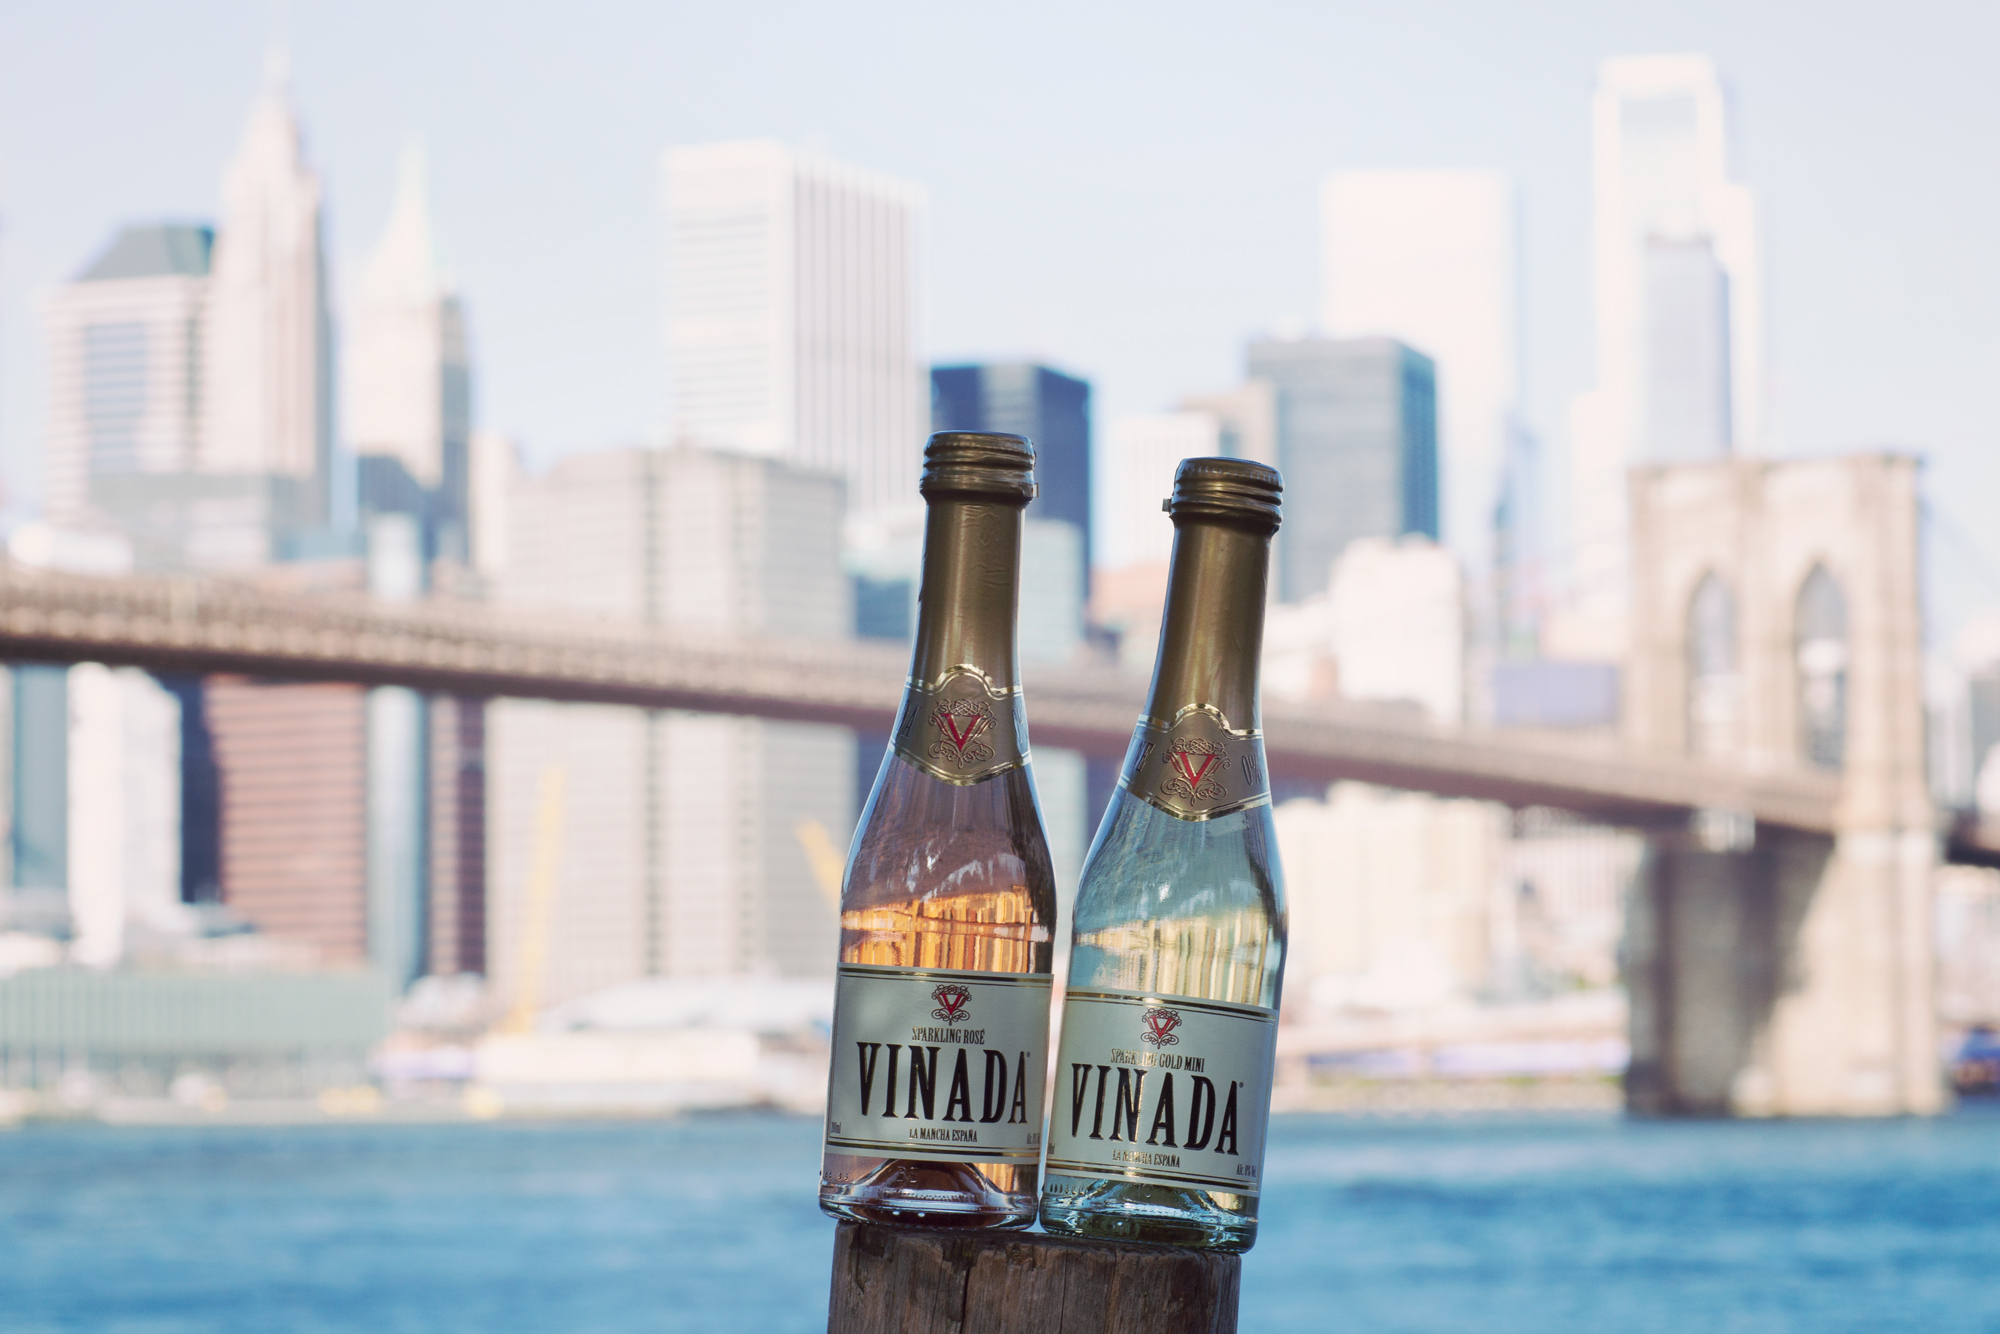 Vinada-New-York-brooklyn-bridge-NY.jpg